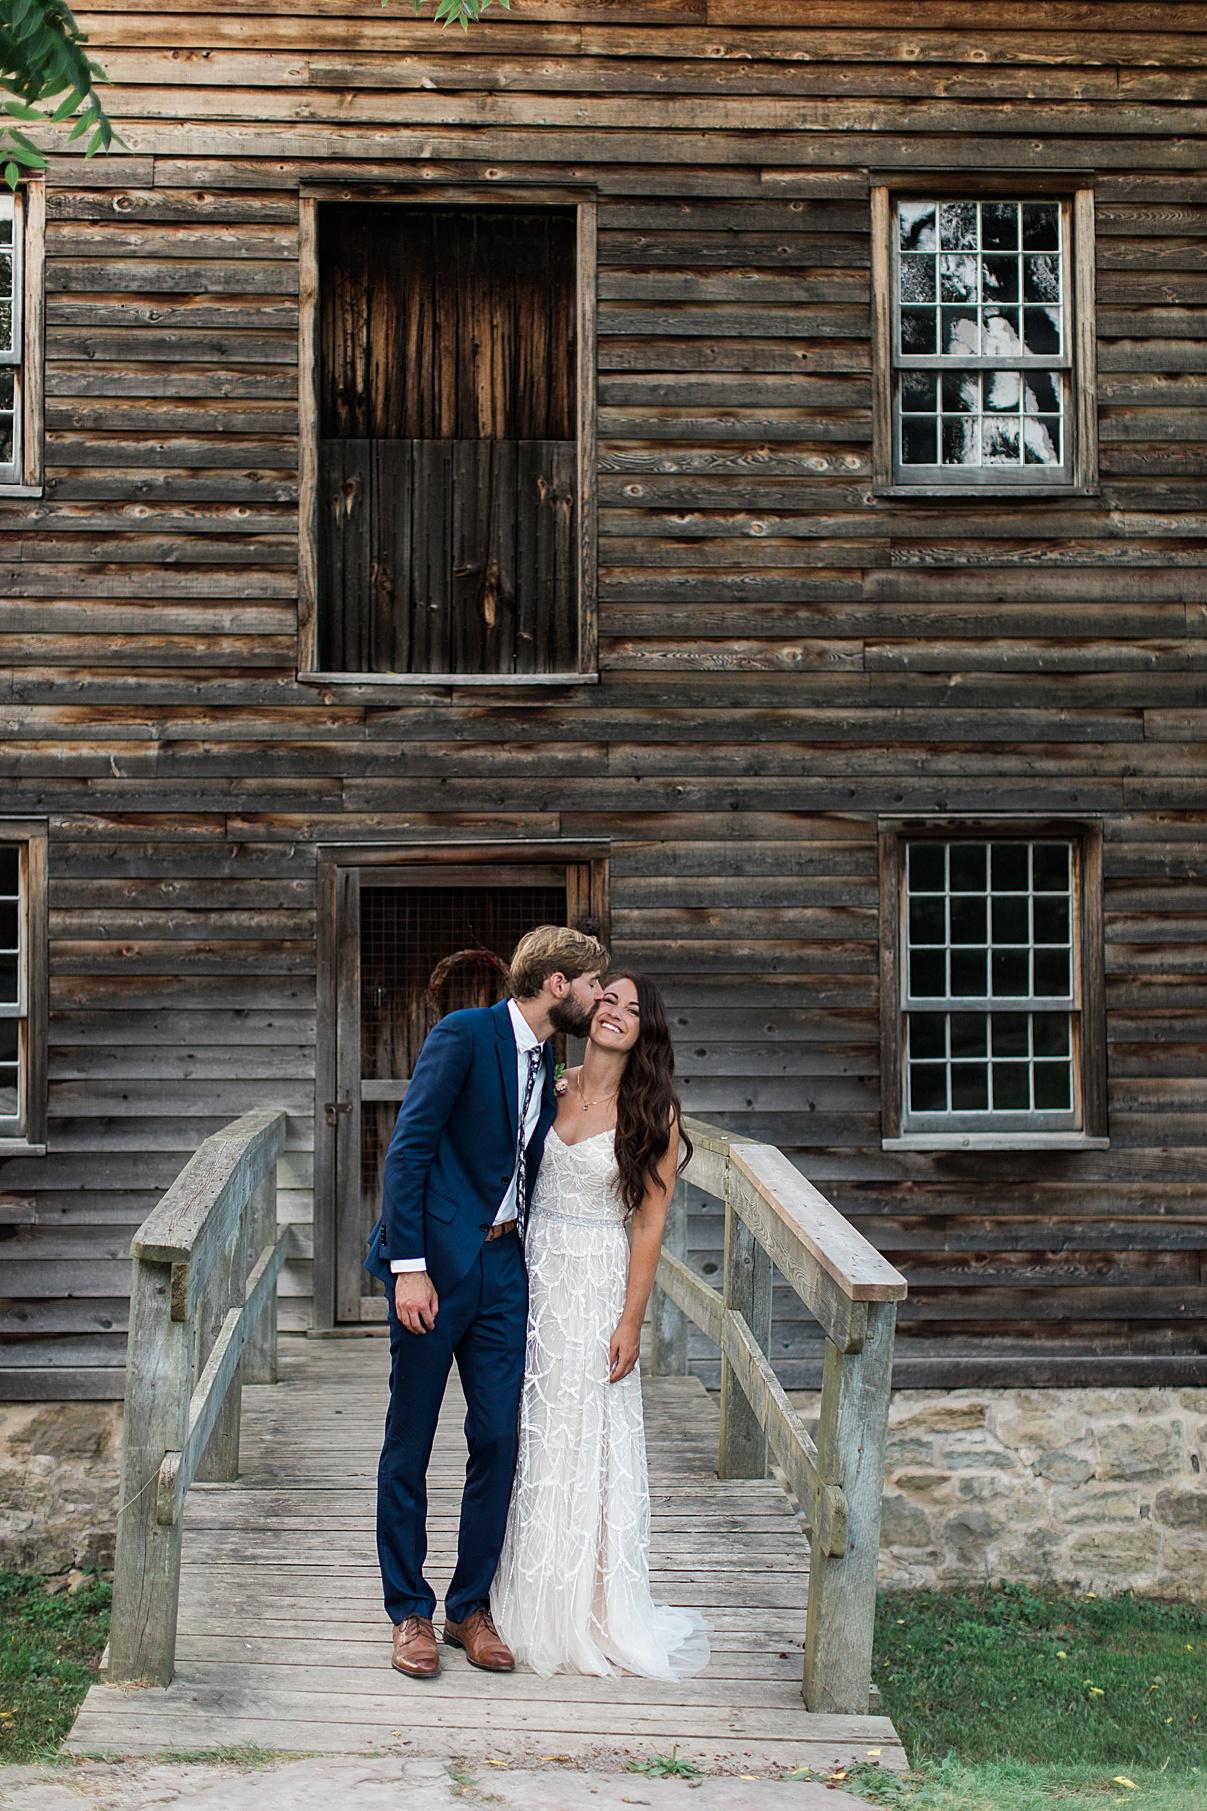 Groom smooches bride in front of abandoned house | Balls Falls, Ontario Wedding| Ontario Wedding Photographer| Toronto Wedding Photographer| 3Photography| 3photography.ca